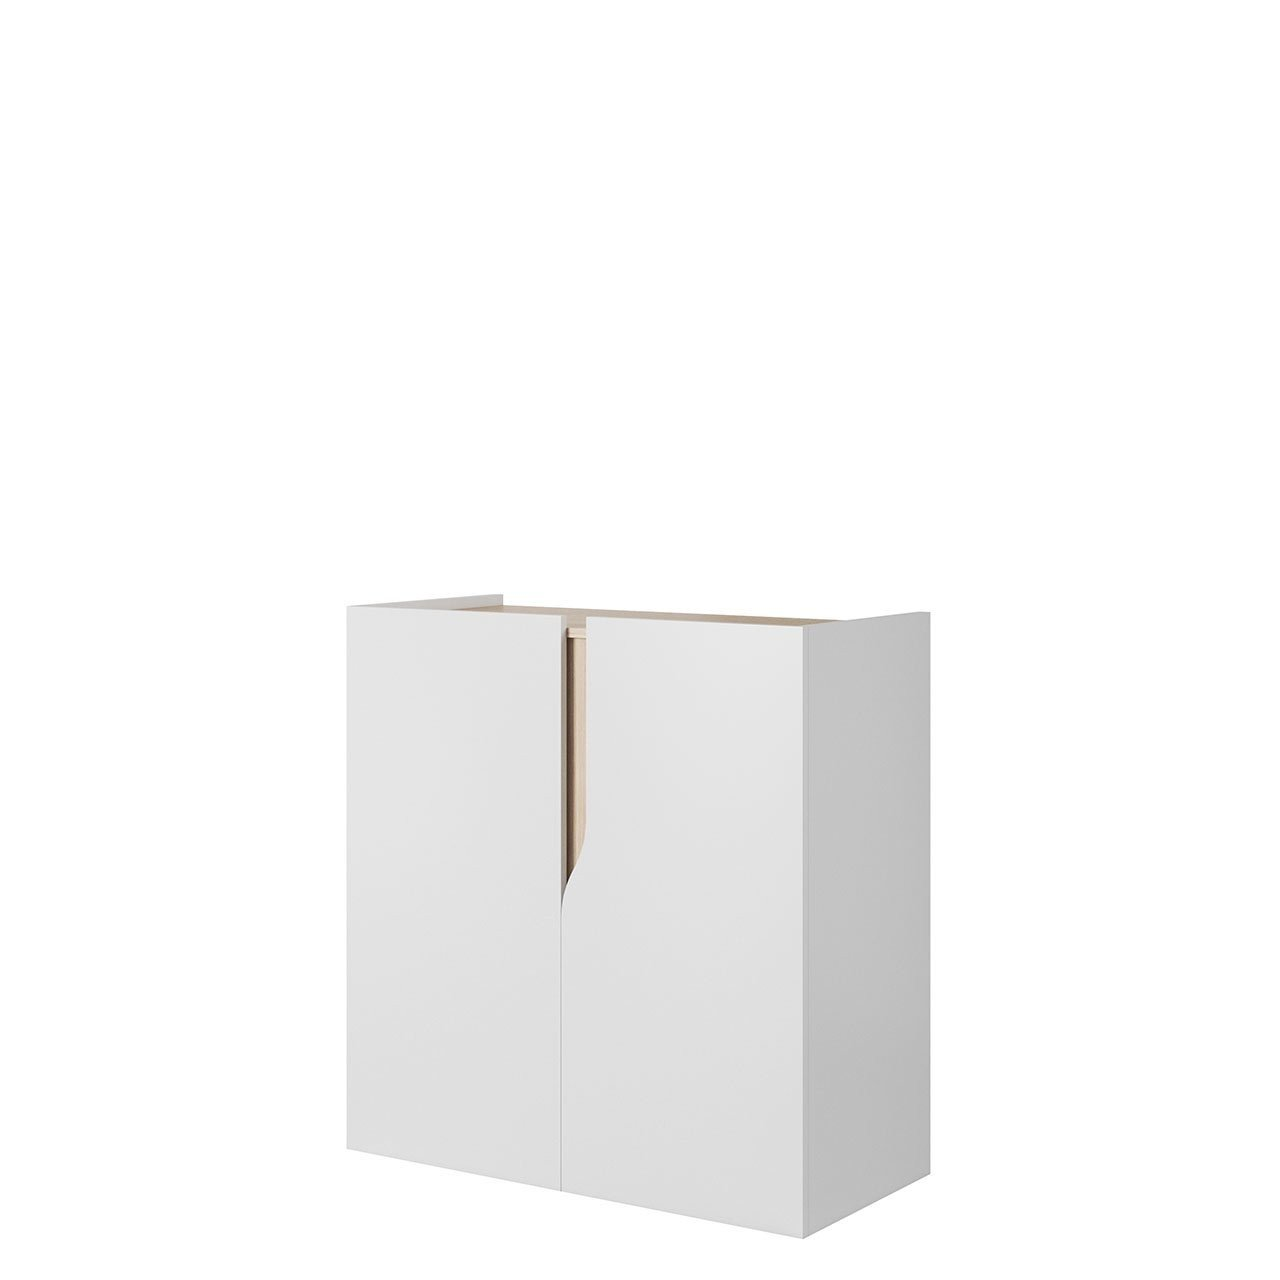 Comoda 92 Block BO04, modern, alb mat